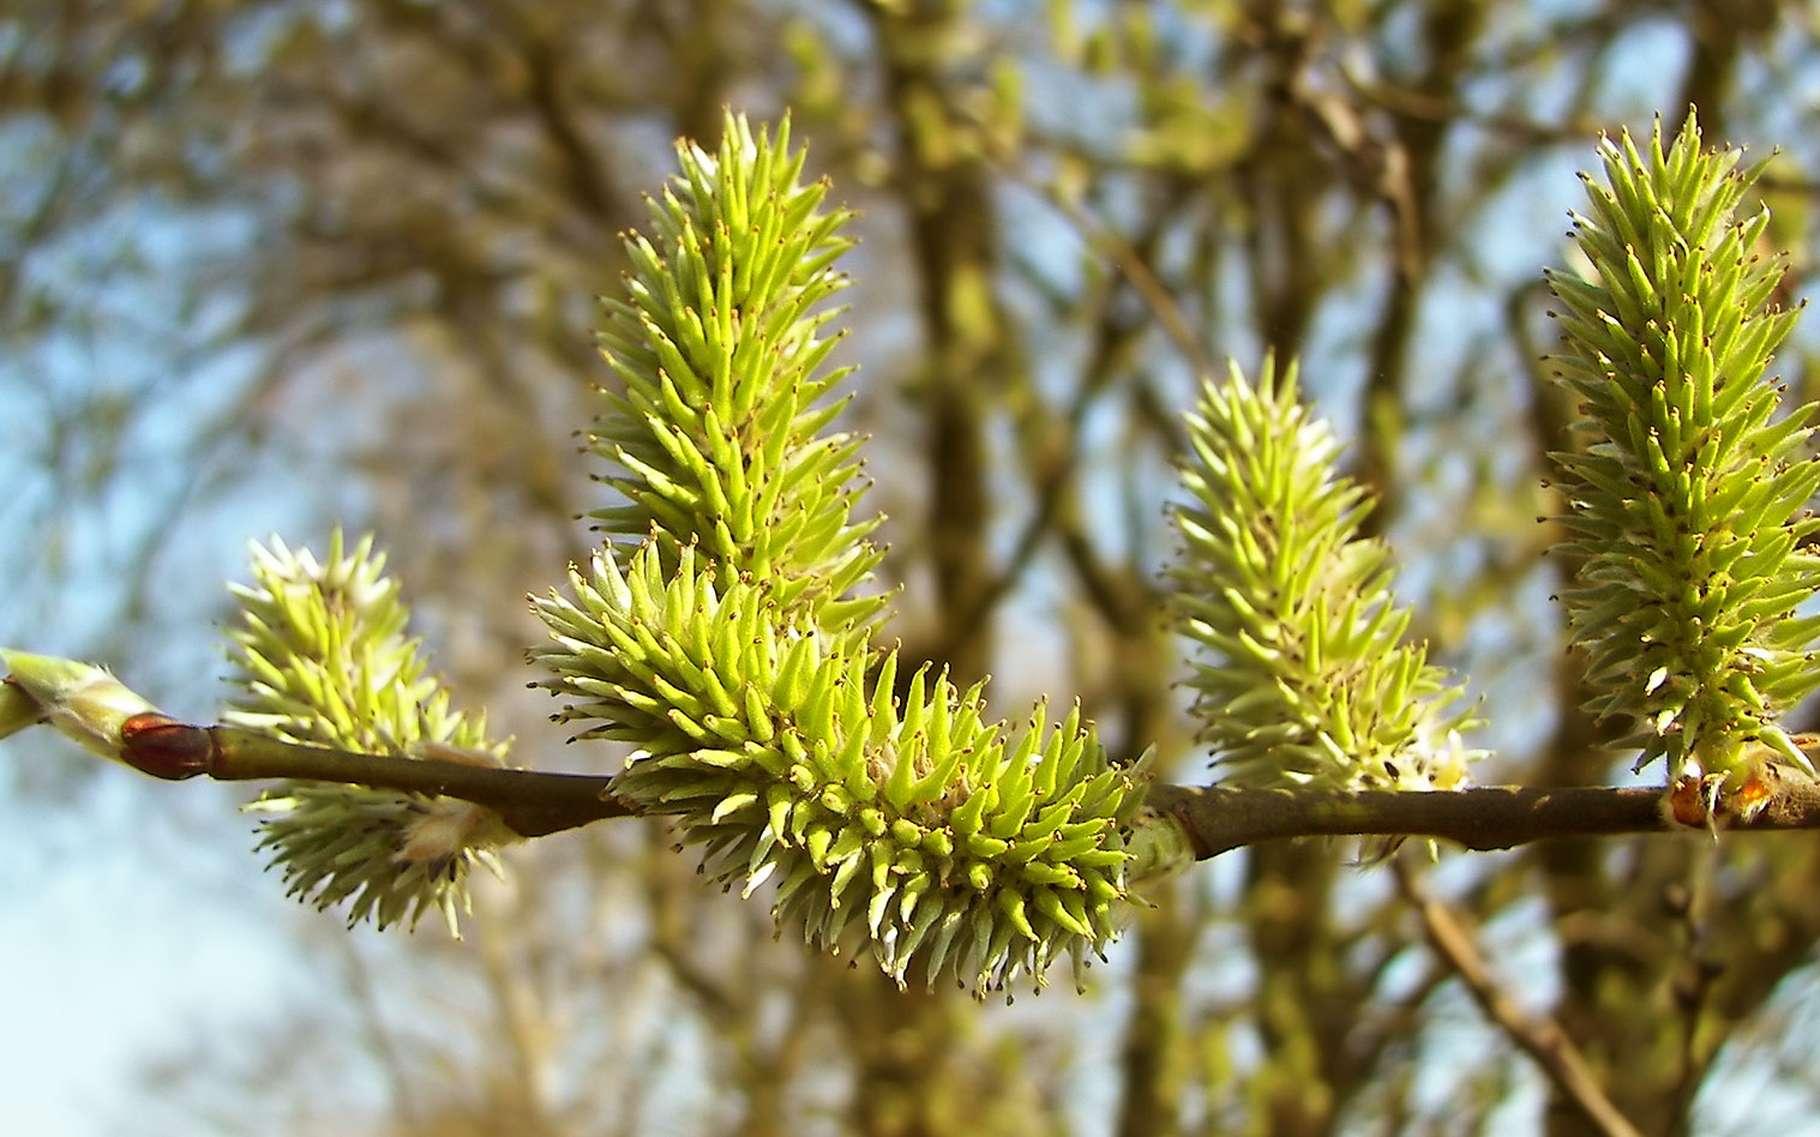 Saule marsault, (Salix caprea), Ort: Lahntal-Goßfelden, Hessen, Deutschland. © Willow, GNU Free Documentation License, Version 1.2